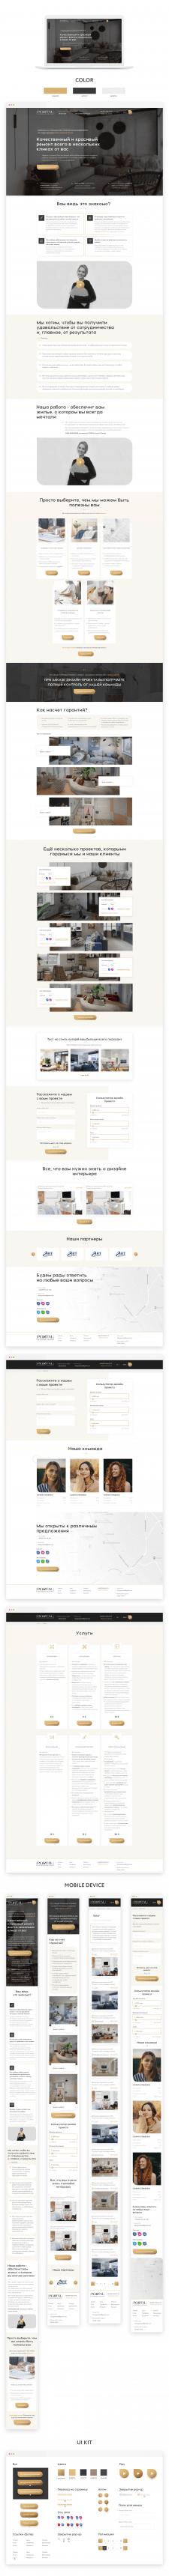 Portal interior design